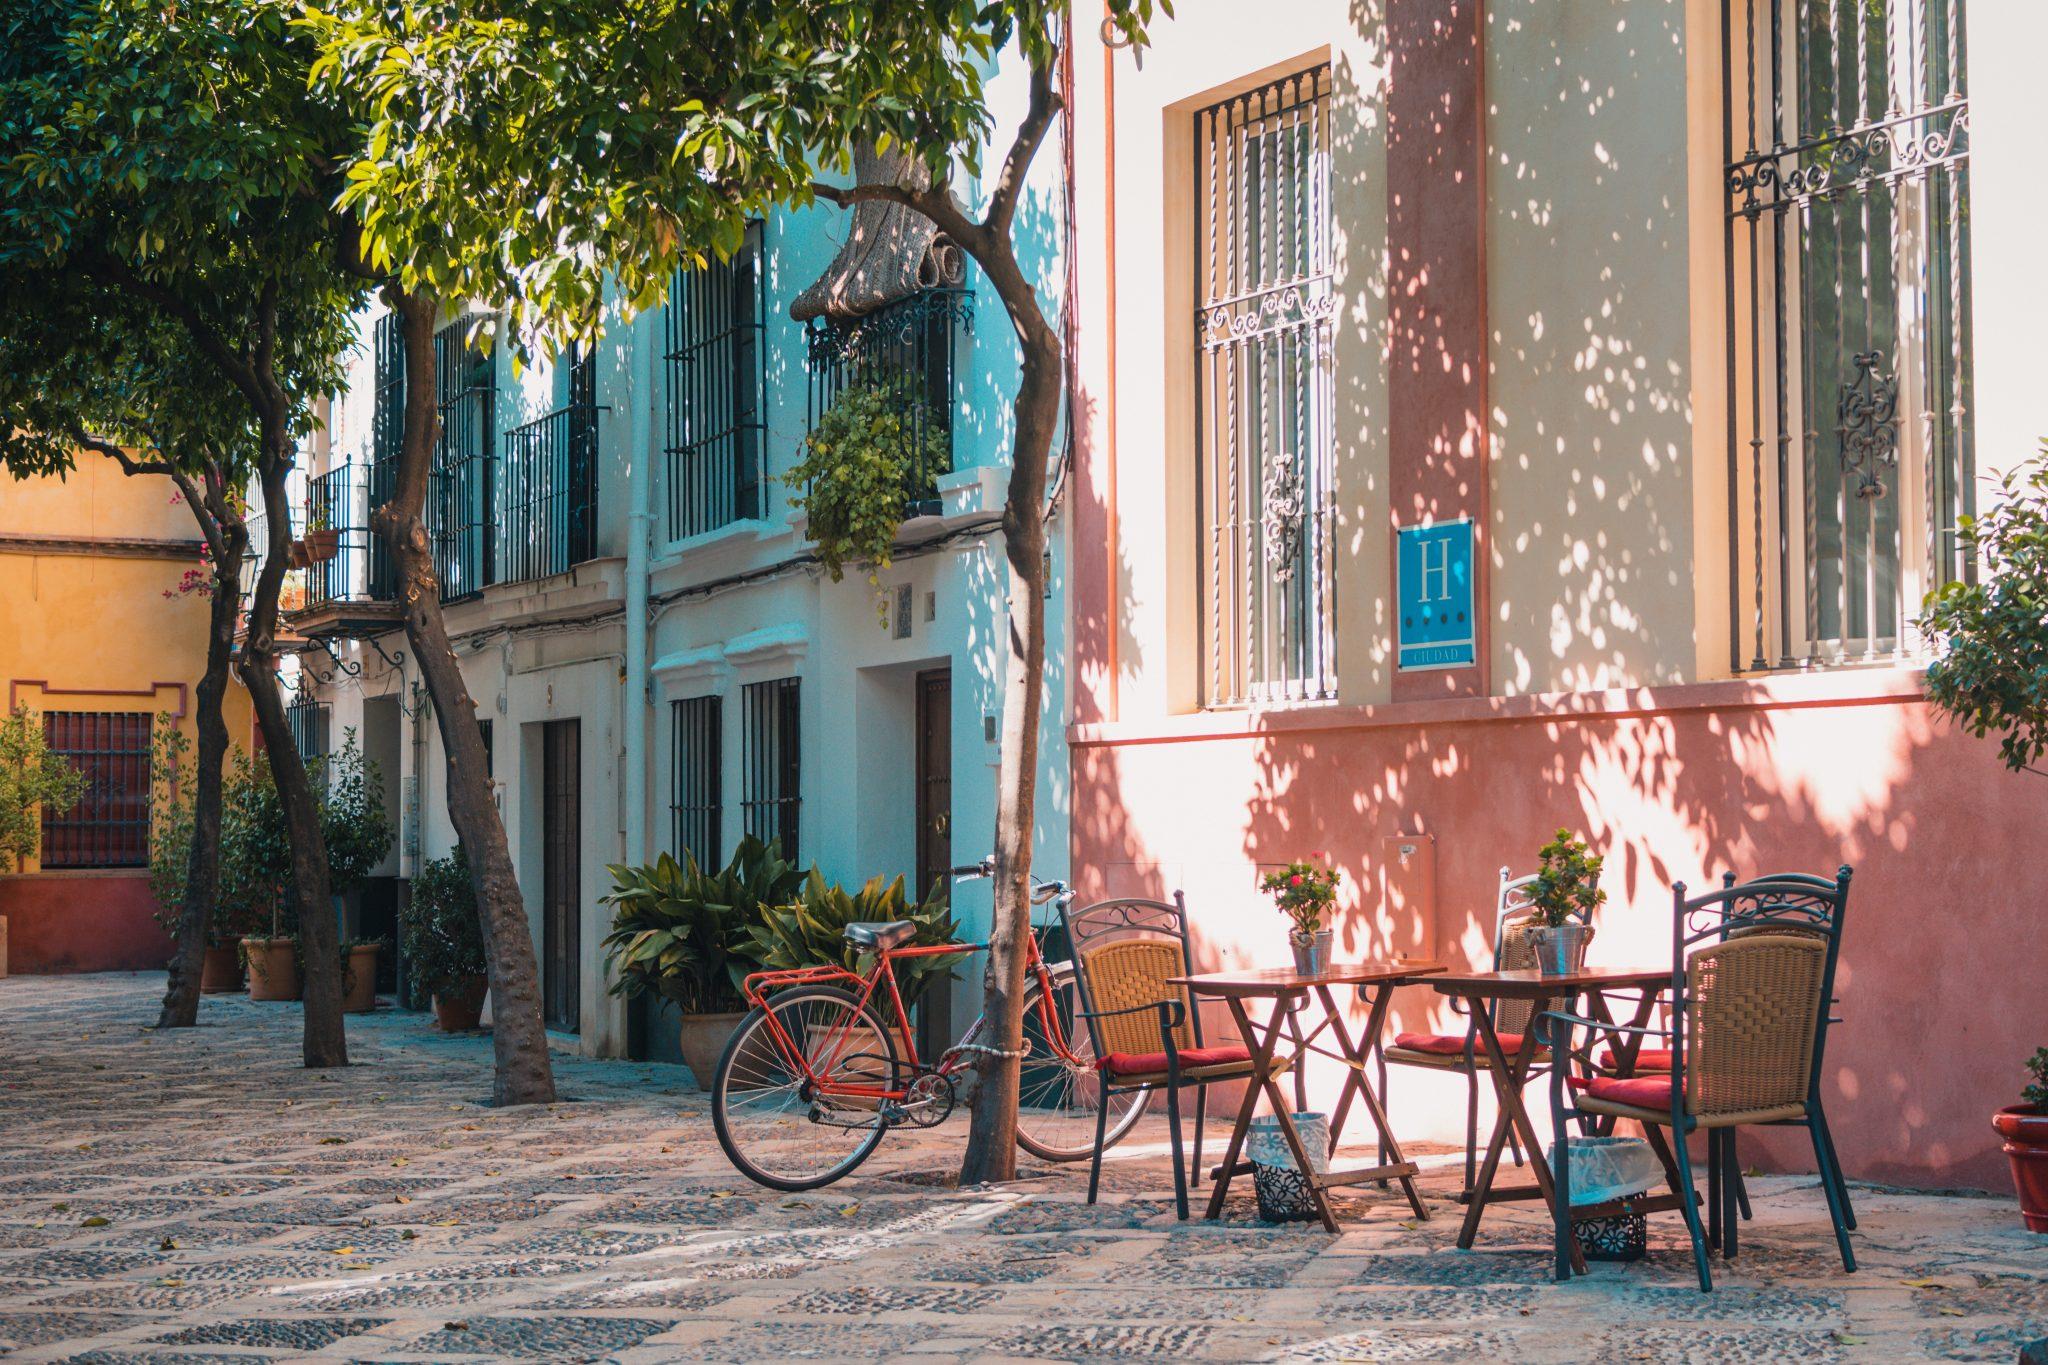 Seville 10